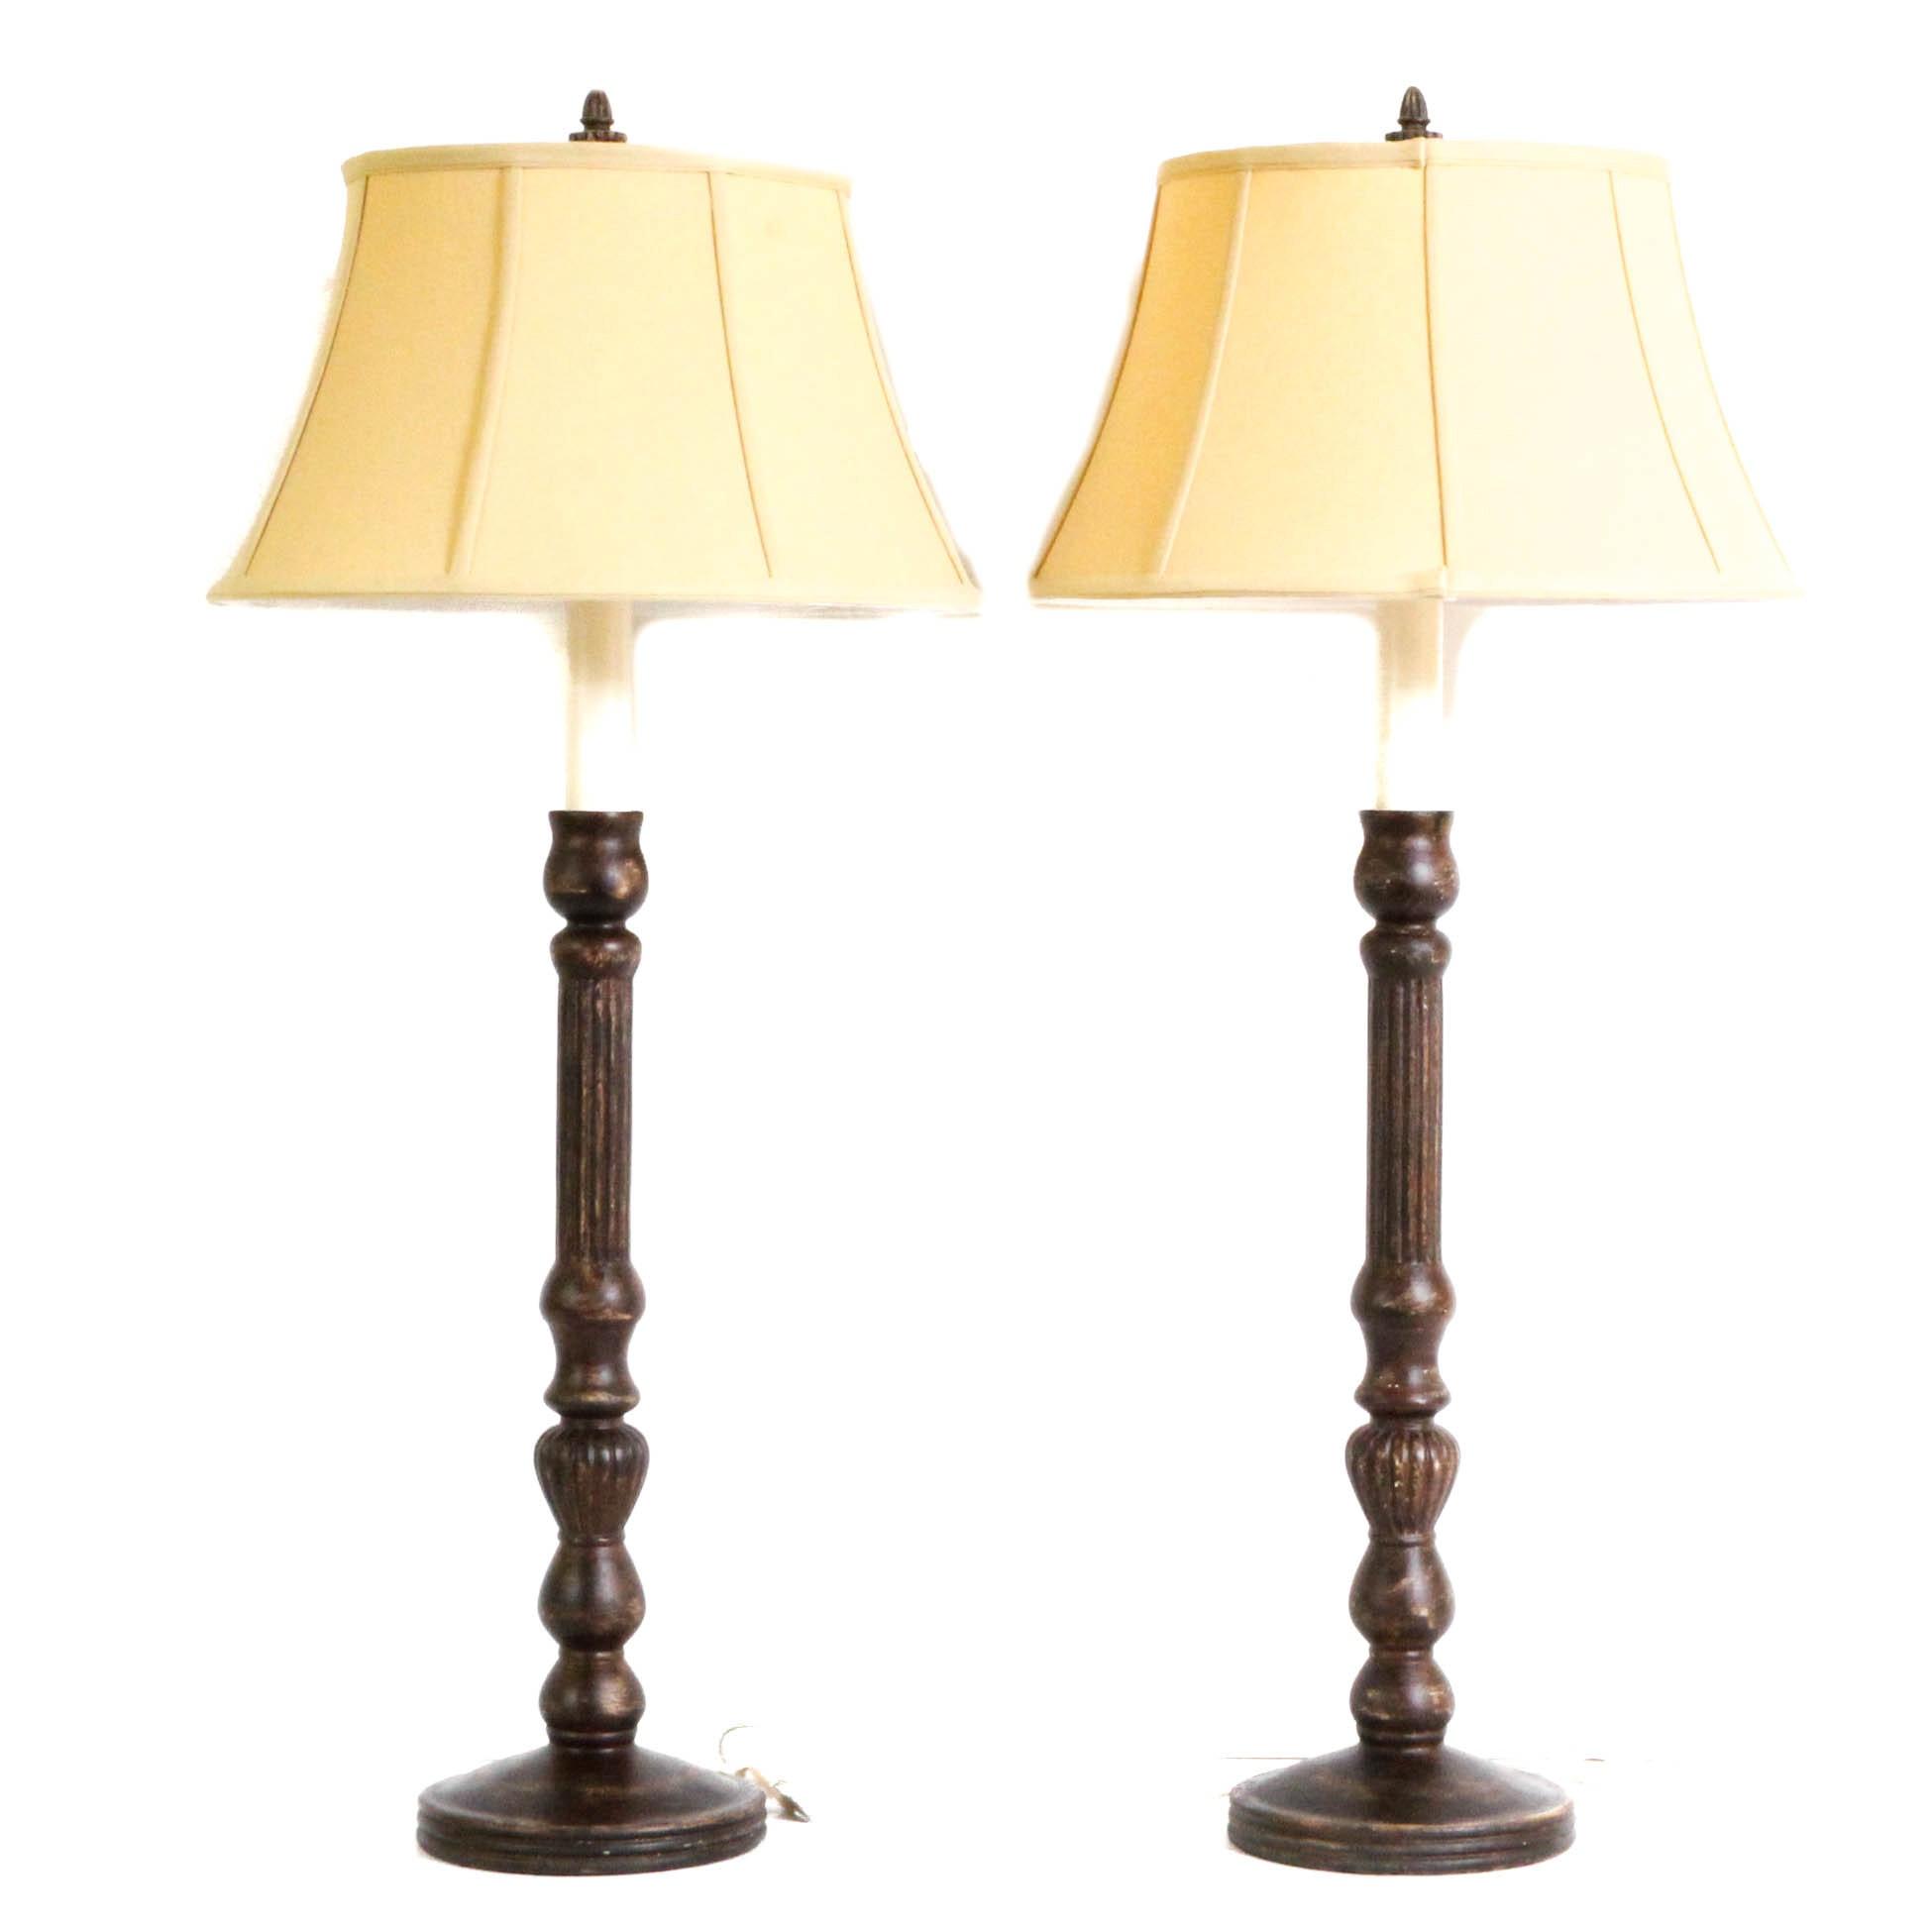 Barbara Cosgrove Rustic Style Table Lamps